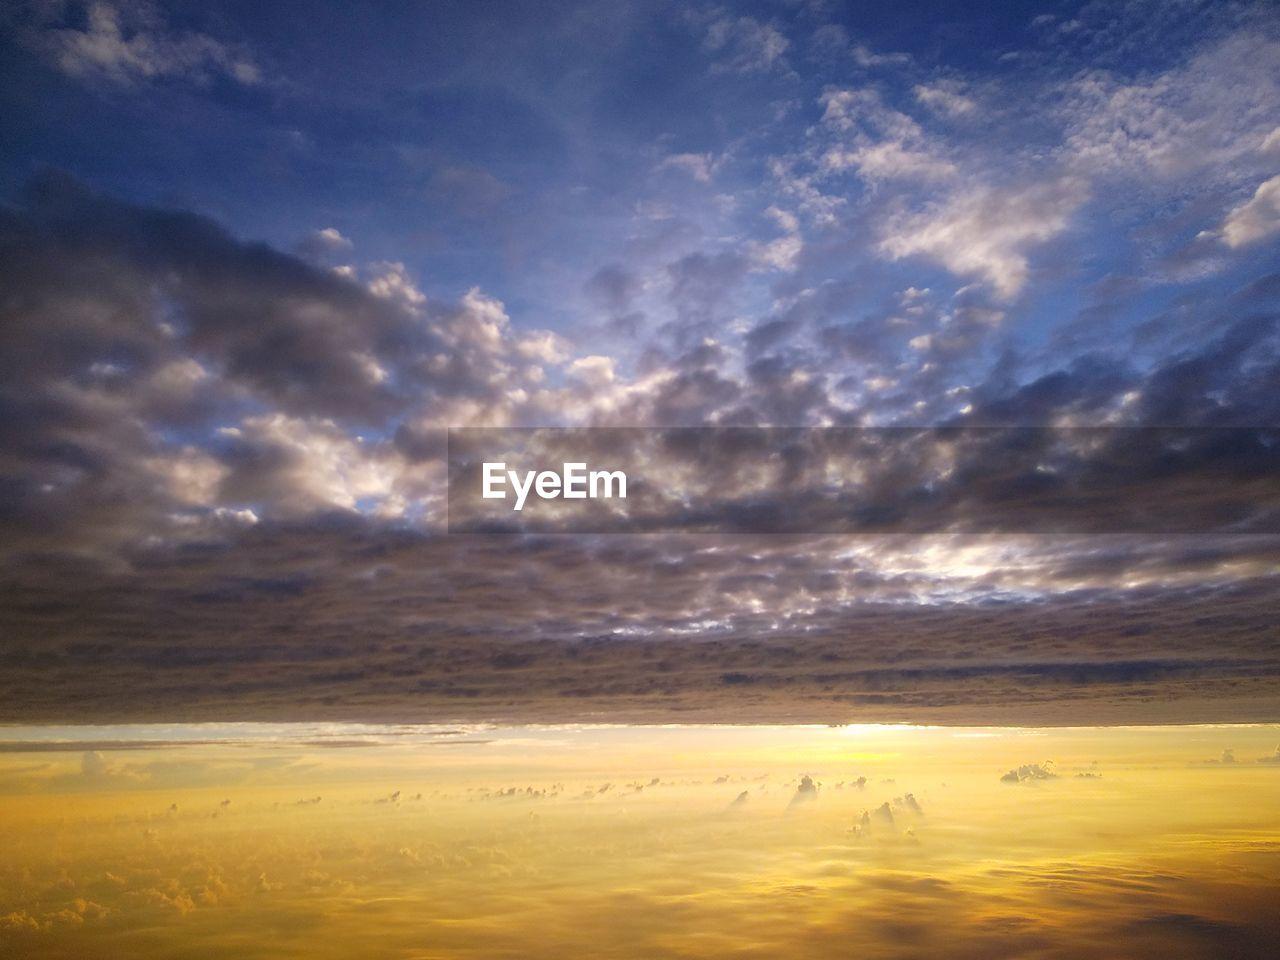 cloud - sky, sky, scenics - nature, beauty in nature, tranquility, tranquil scene, sunset, nature, no people, idyllic, dramatic sky, outdoors, cloudscape, environment, non-urban scene, sunlight, orange color, horizon, landscape